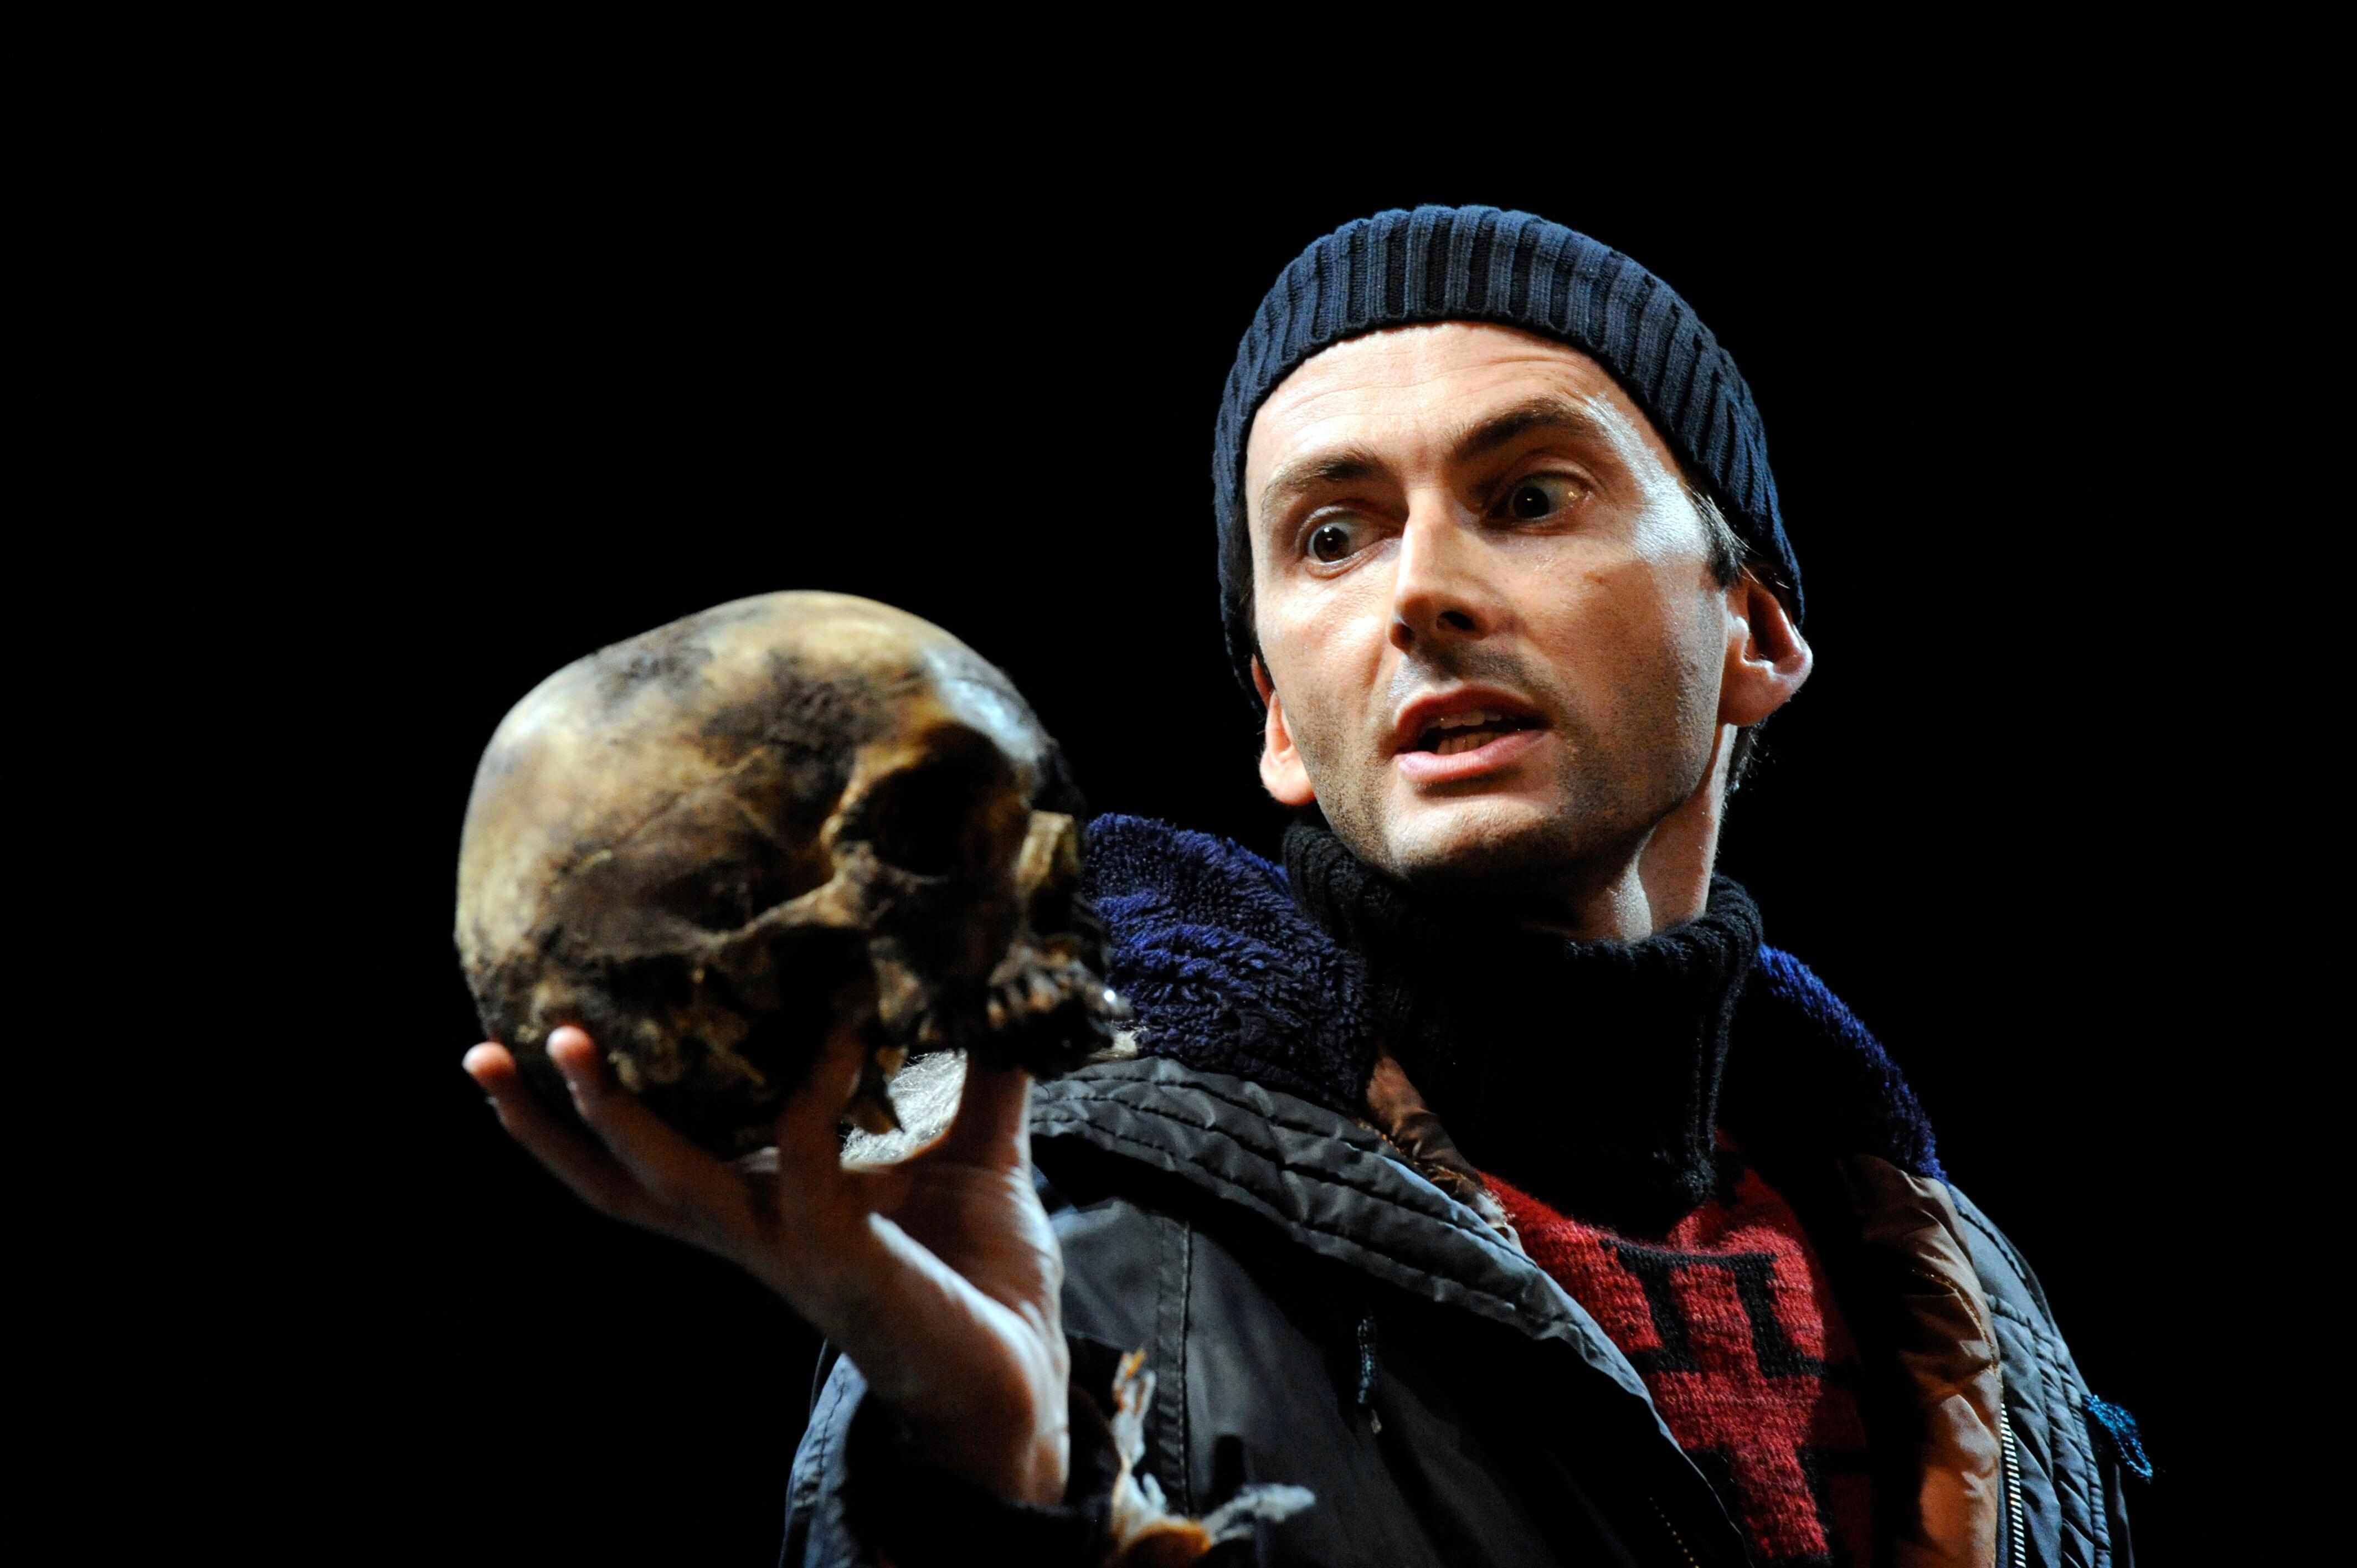 David Tennant playing Hamlet in the Royal Shakespeare Company